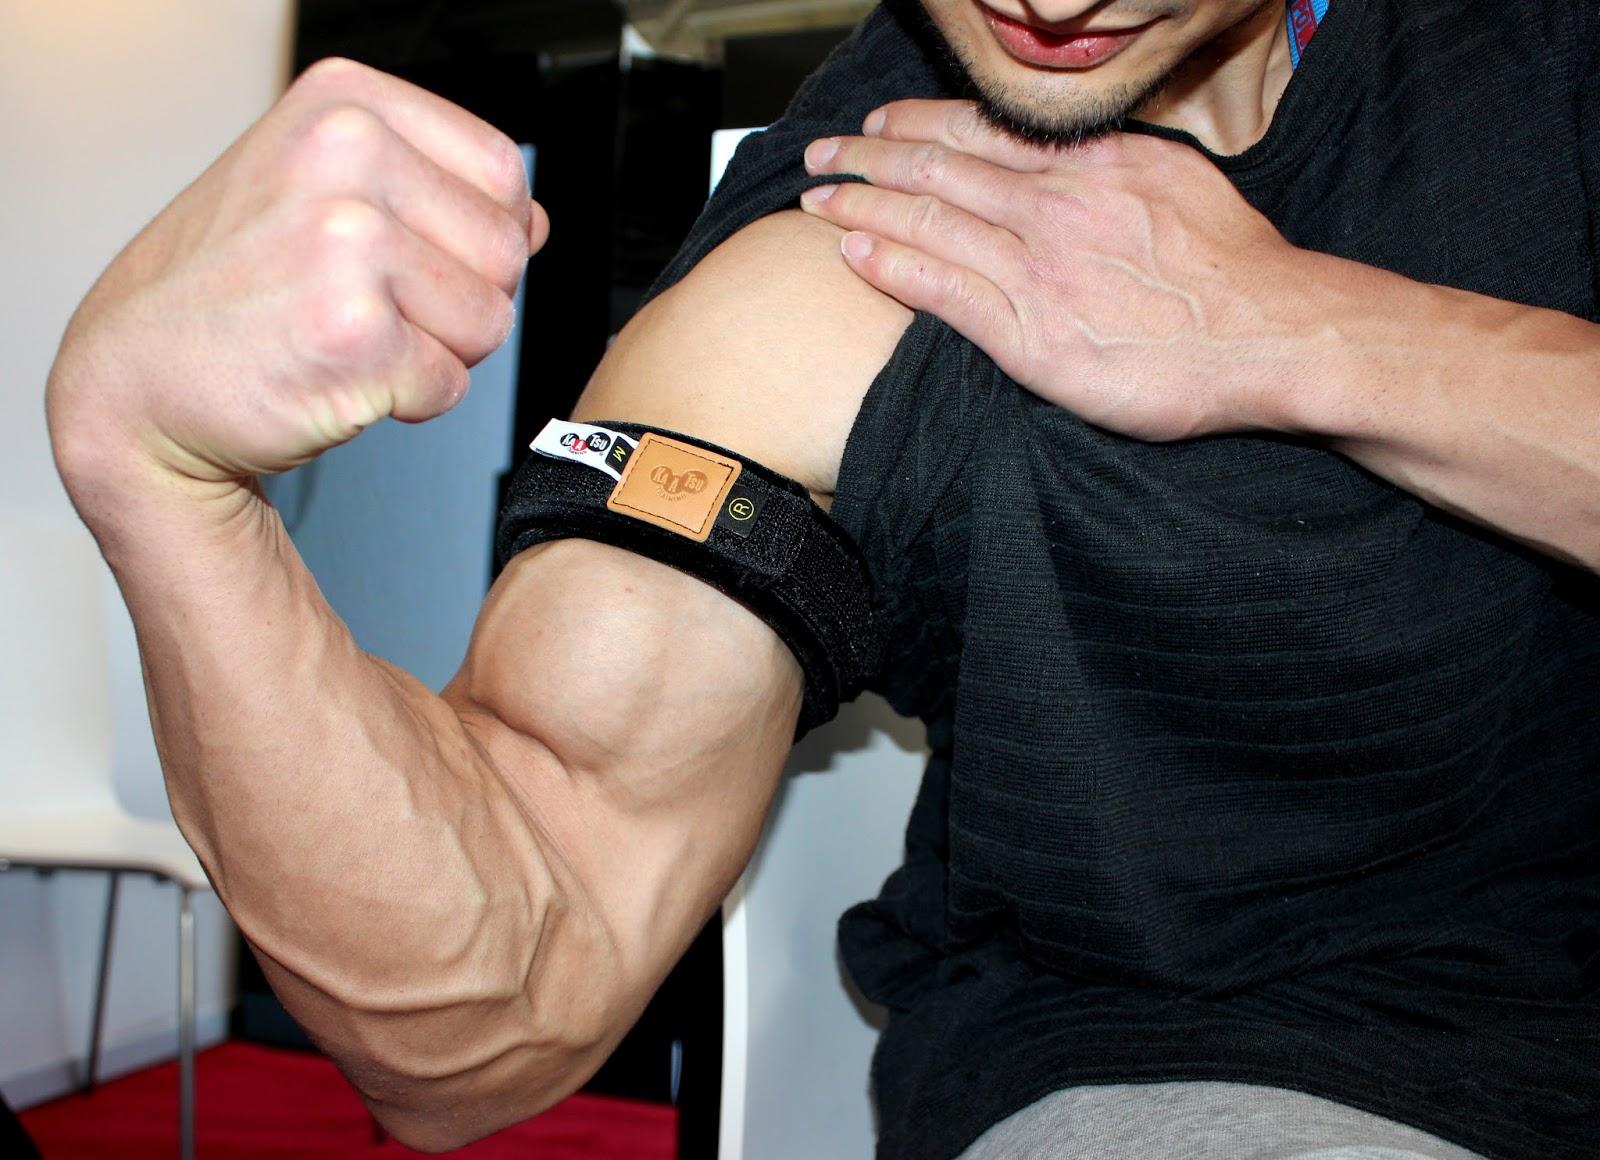 http://www.kaatsublog.com/2015/08/building-biceps-with-kaatsu.html